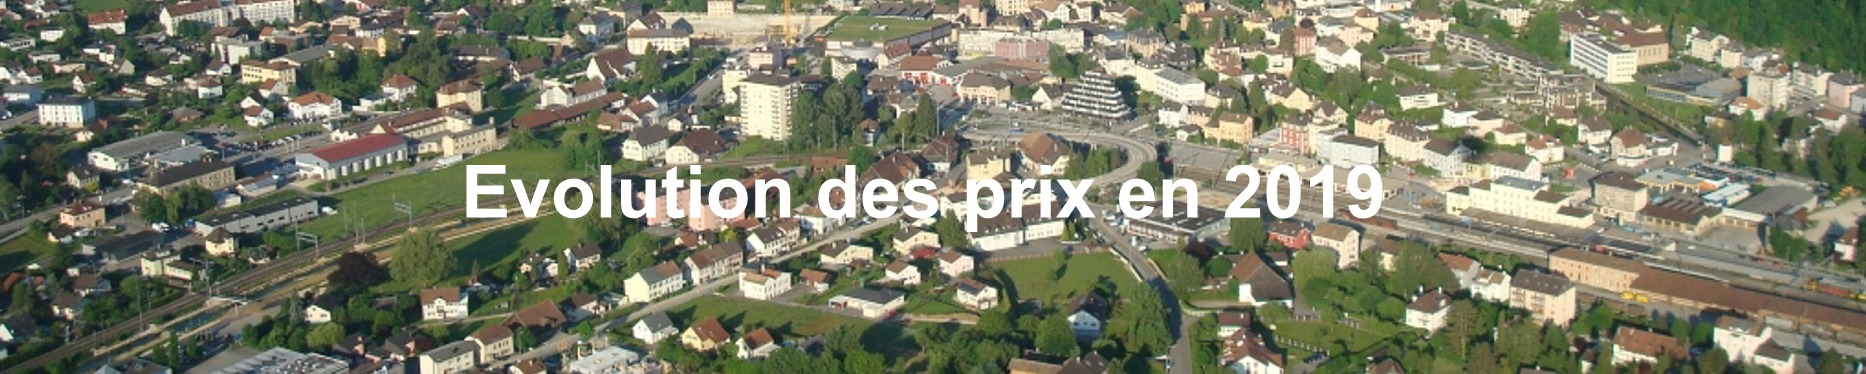 evolution prix m2 immobilier jura 2019